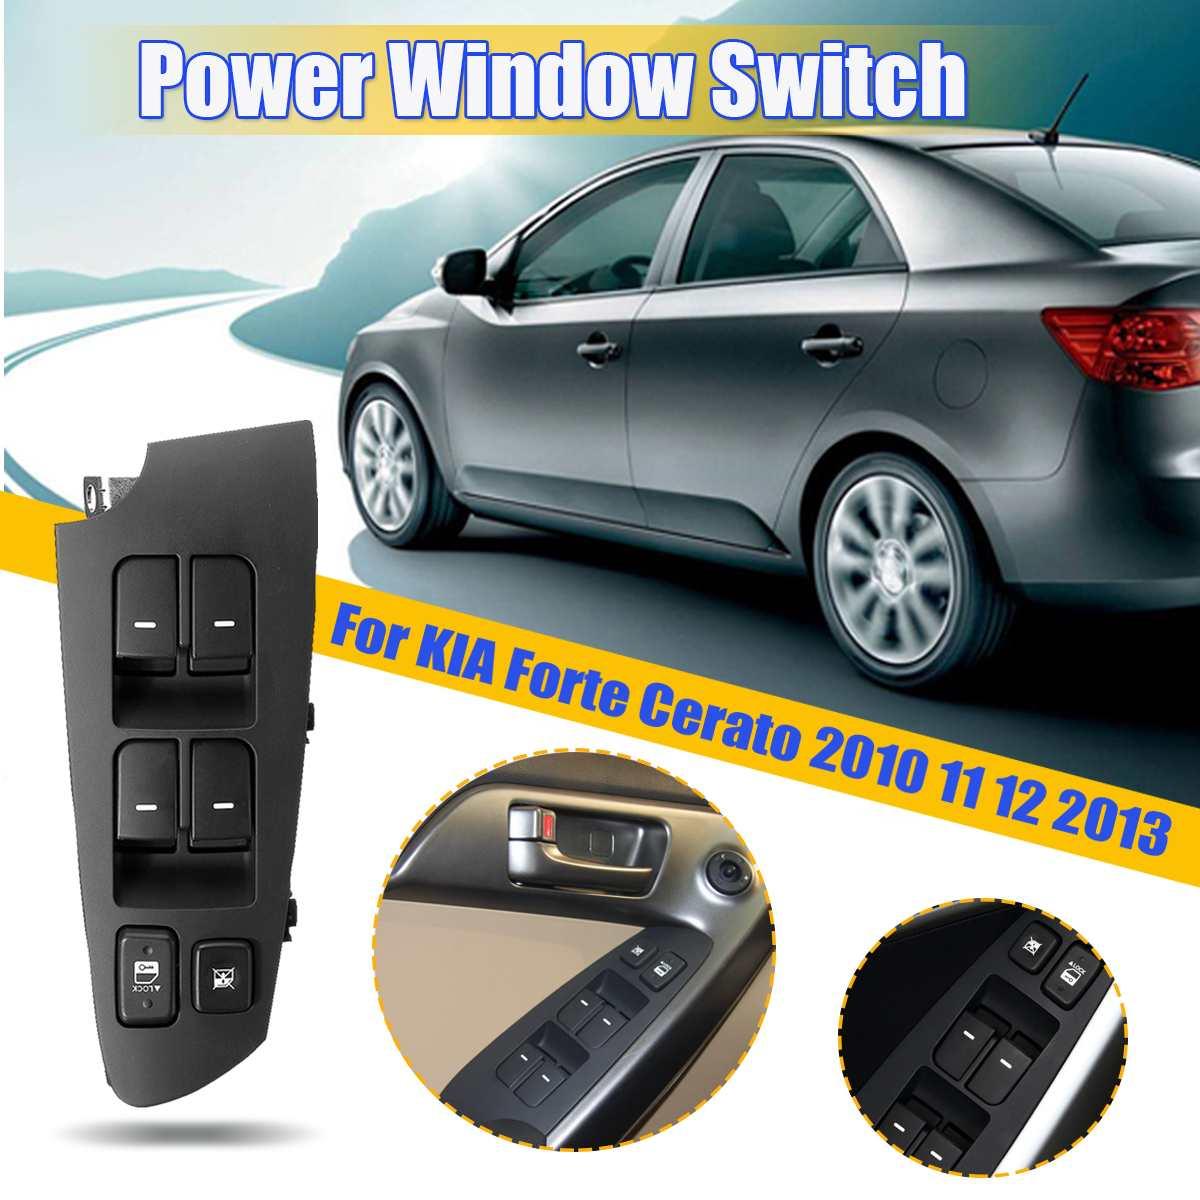 H Assy for 2010 2012 Kia Forte Rear L ALL New Cerato Power Window Switch